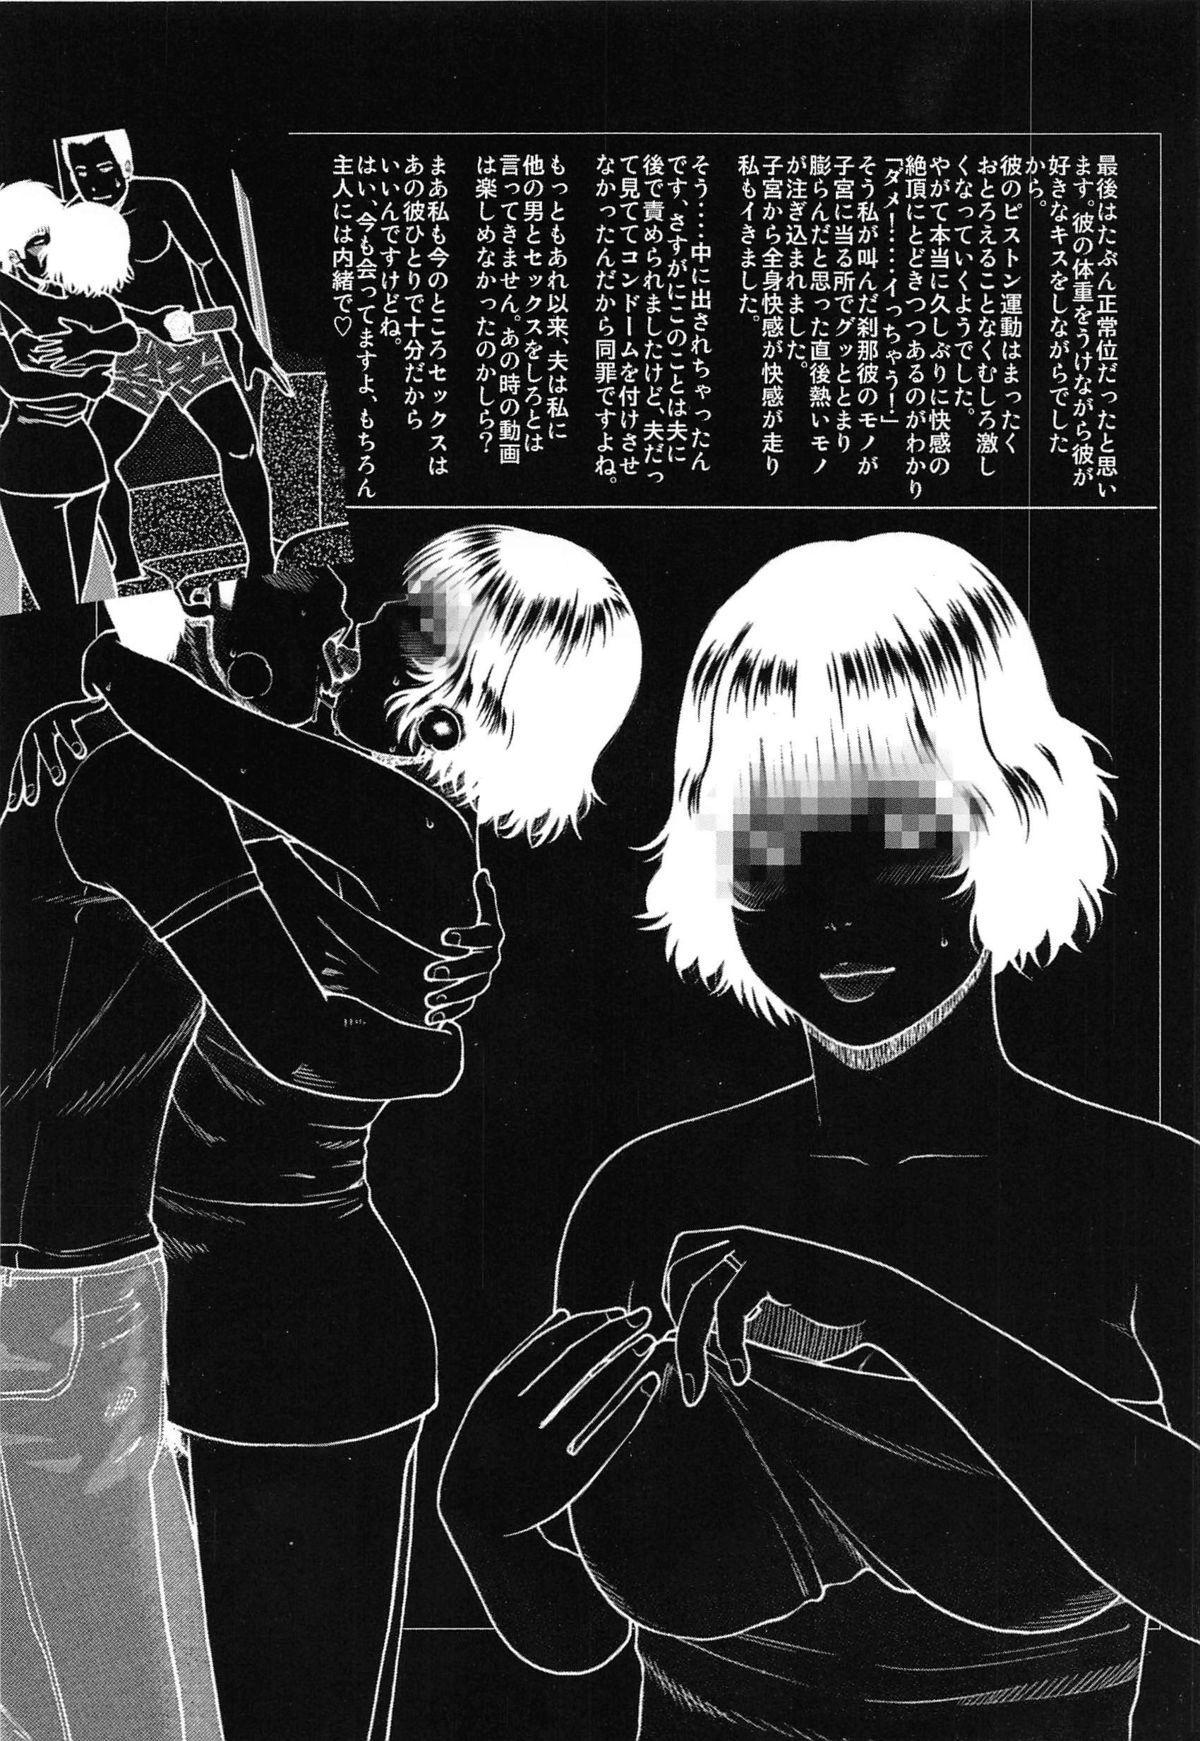 [Kuroki Hidehiko] 35 Sai Yarigoro Zuma   35-Year-Old Ripe Wife [English] {Tadanohito} 3